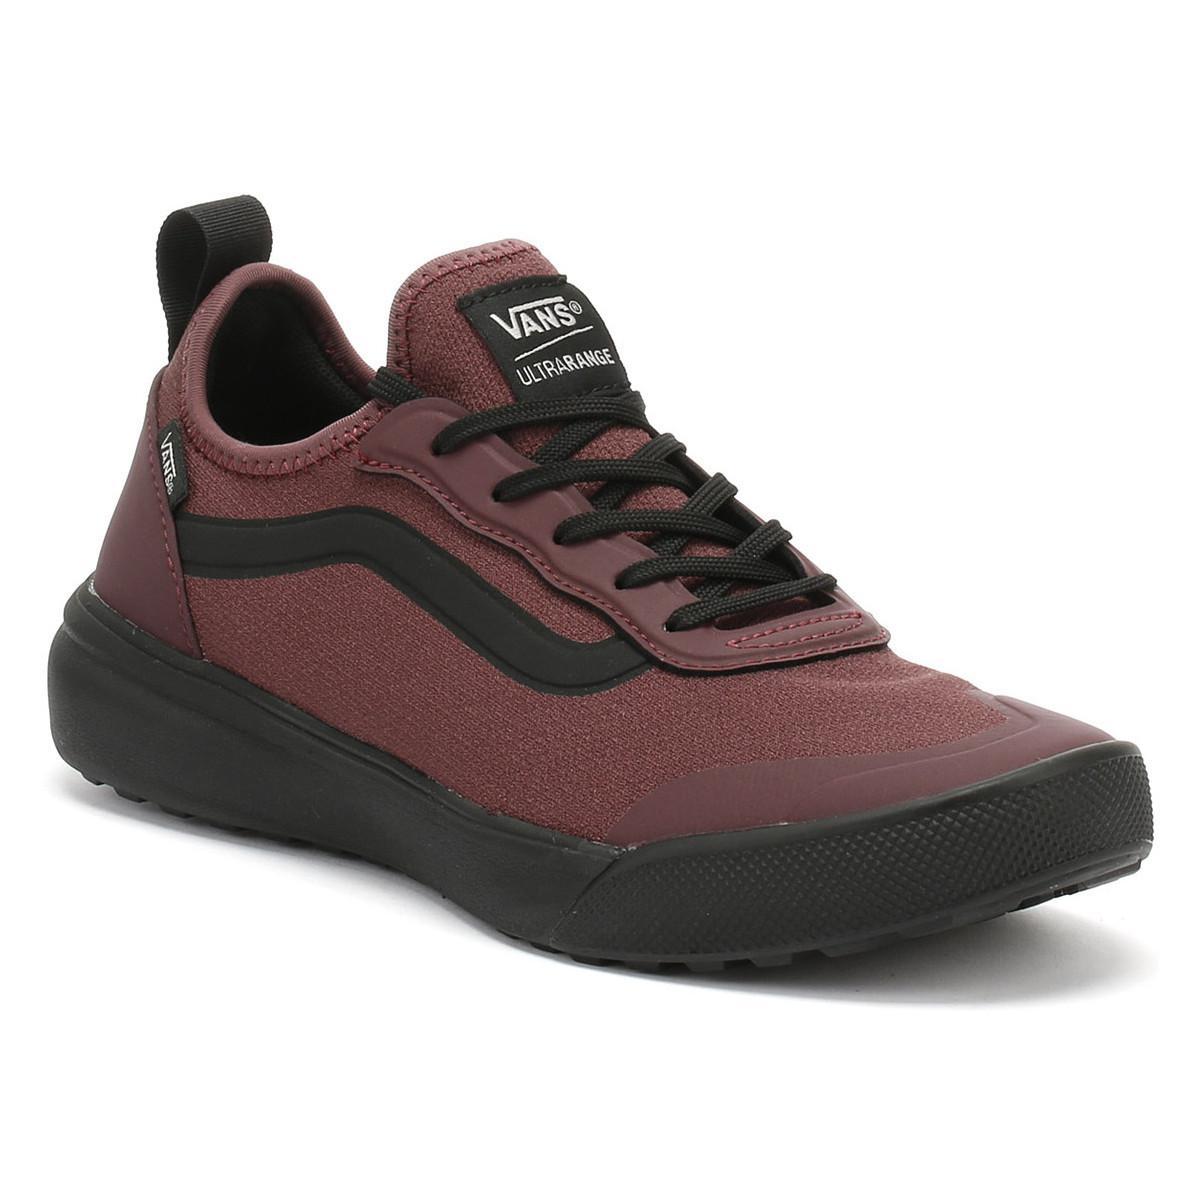 067d9505732 Vans - Catawba Grape Burgundy   Black Ultrarange Ac Trainers Women s Shoes  (trainers) In. View fullscreen